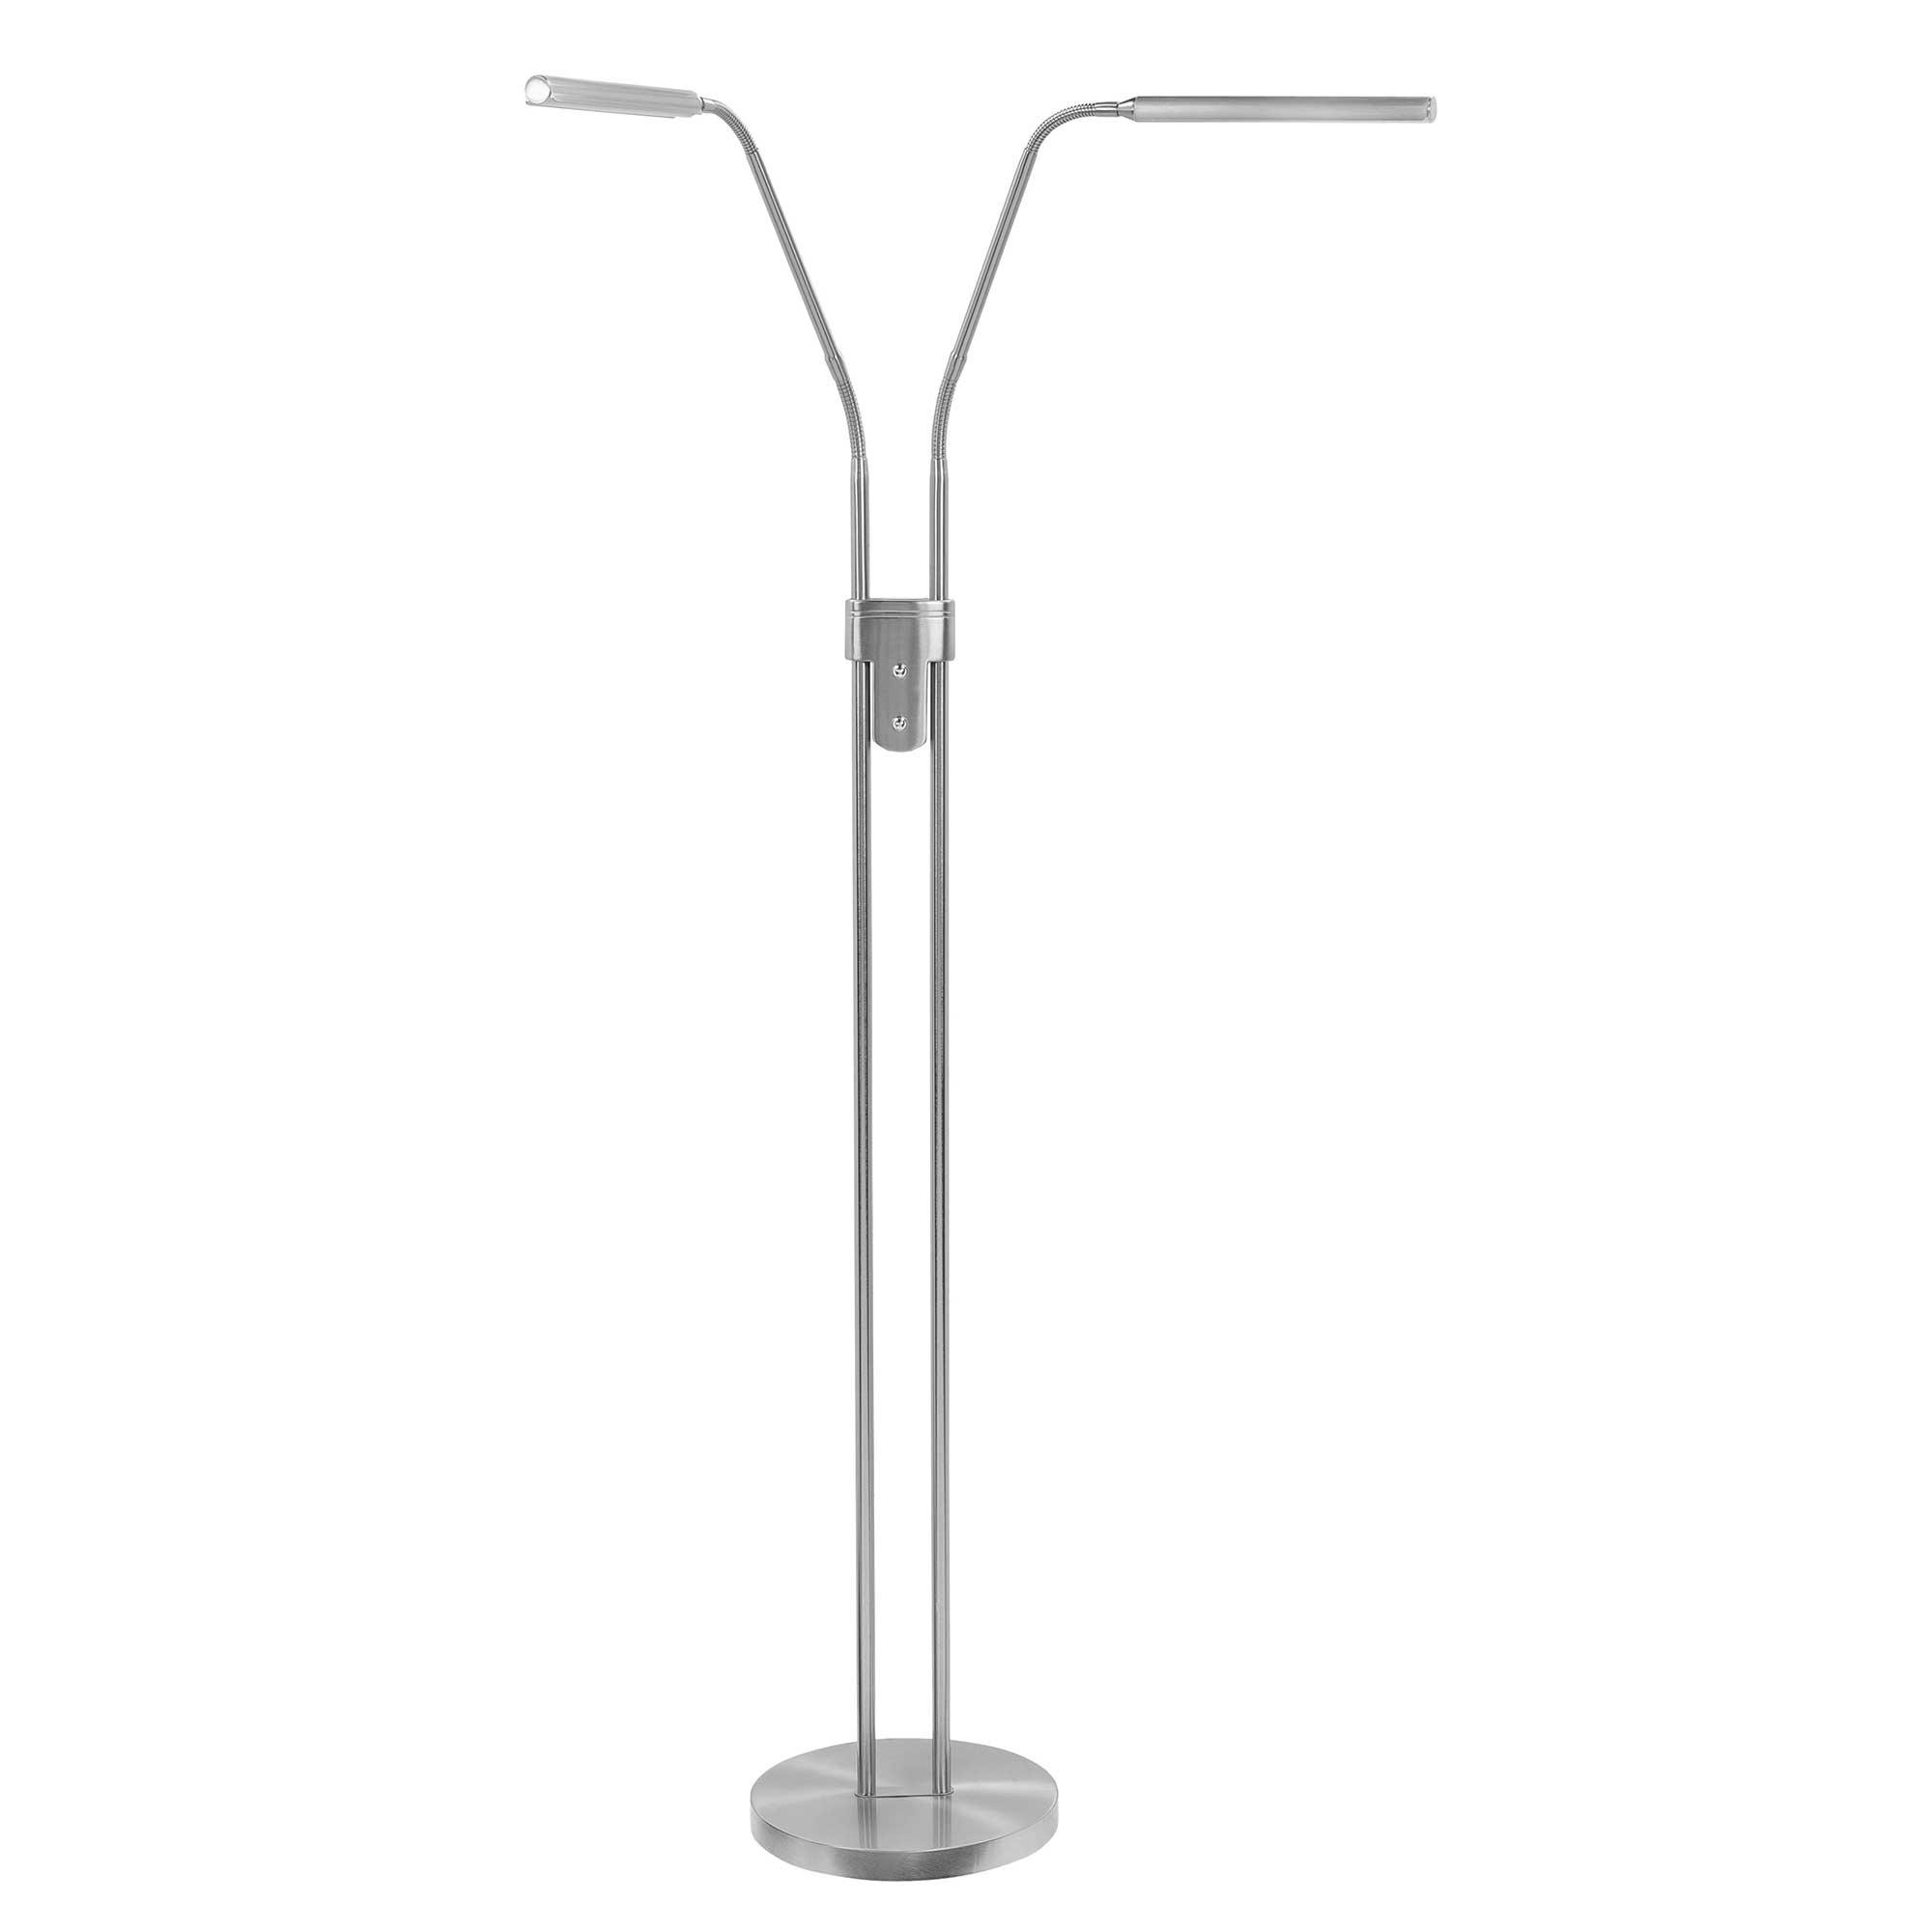 Highlight Vloerlamp Murcia 2 lichts H 145 cm mat chroom